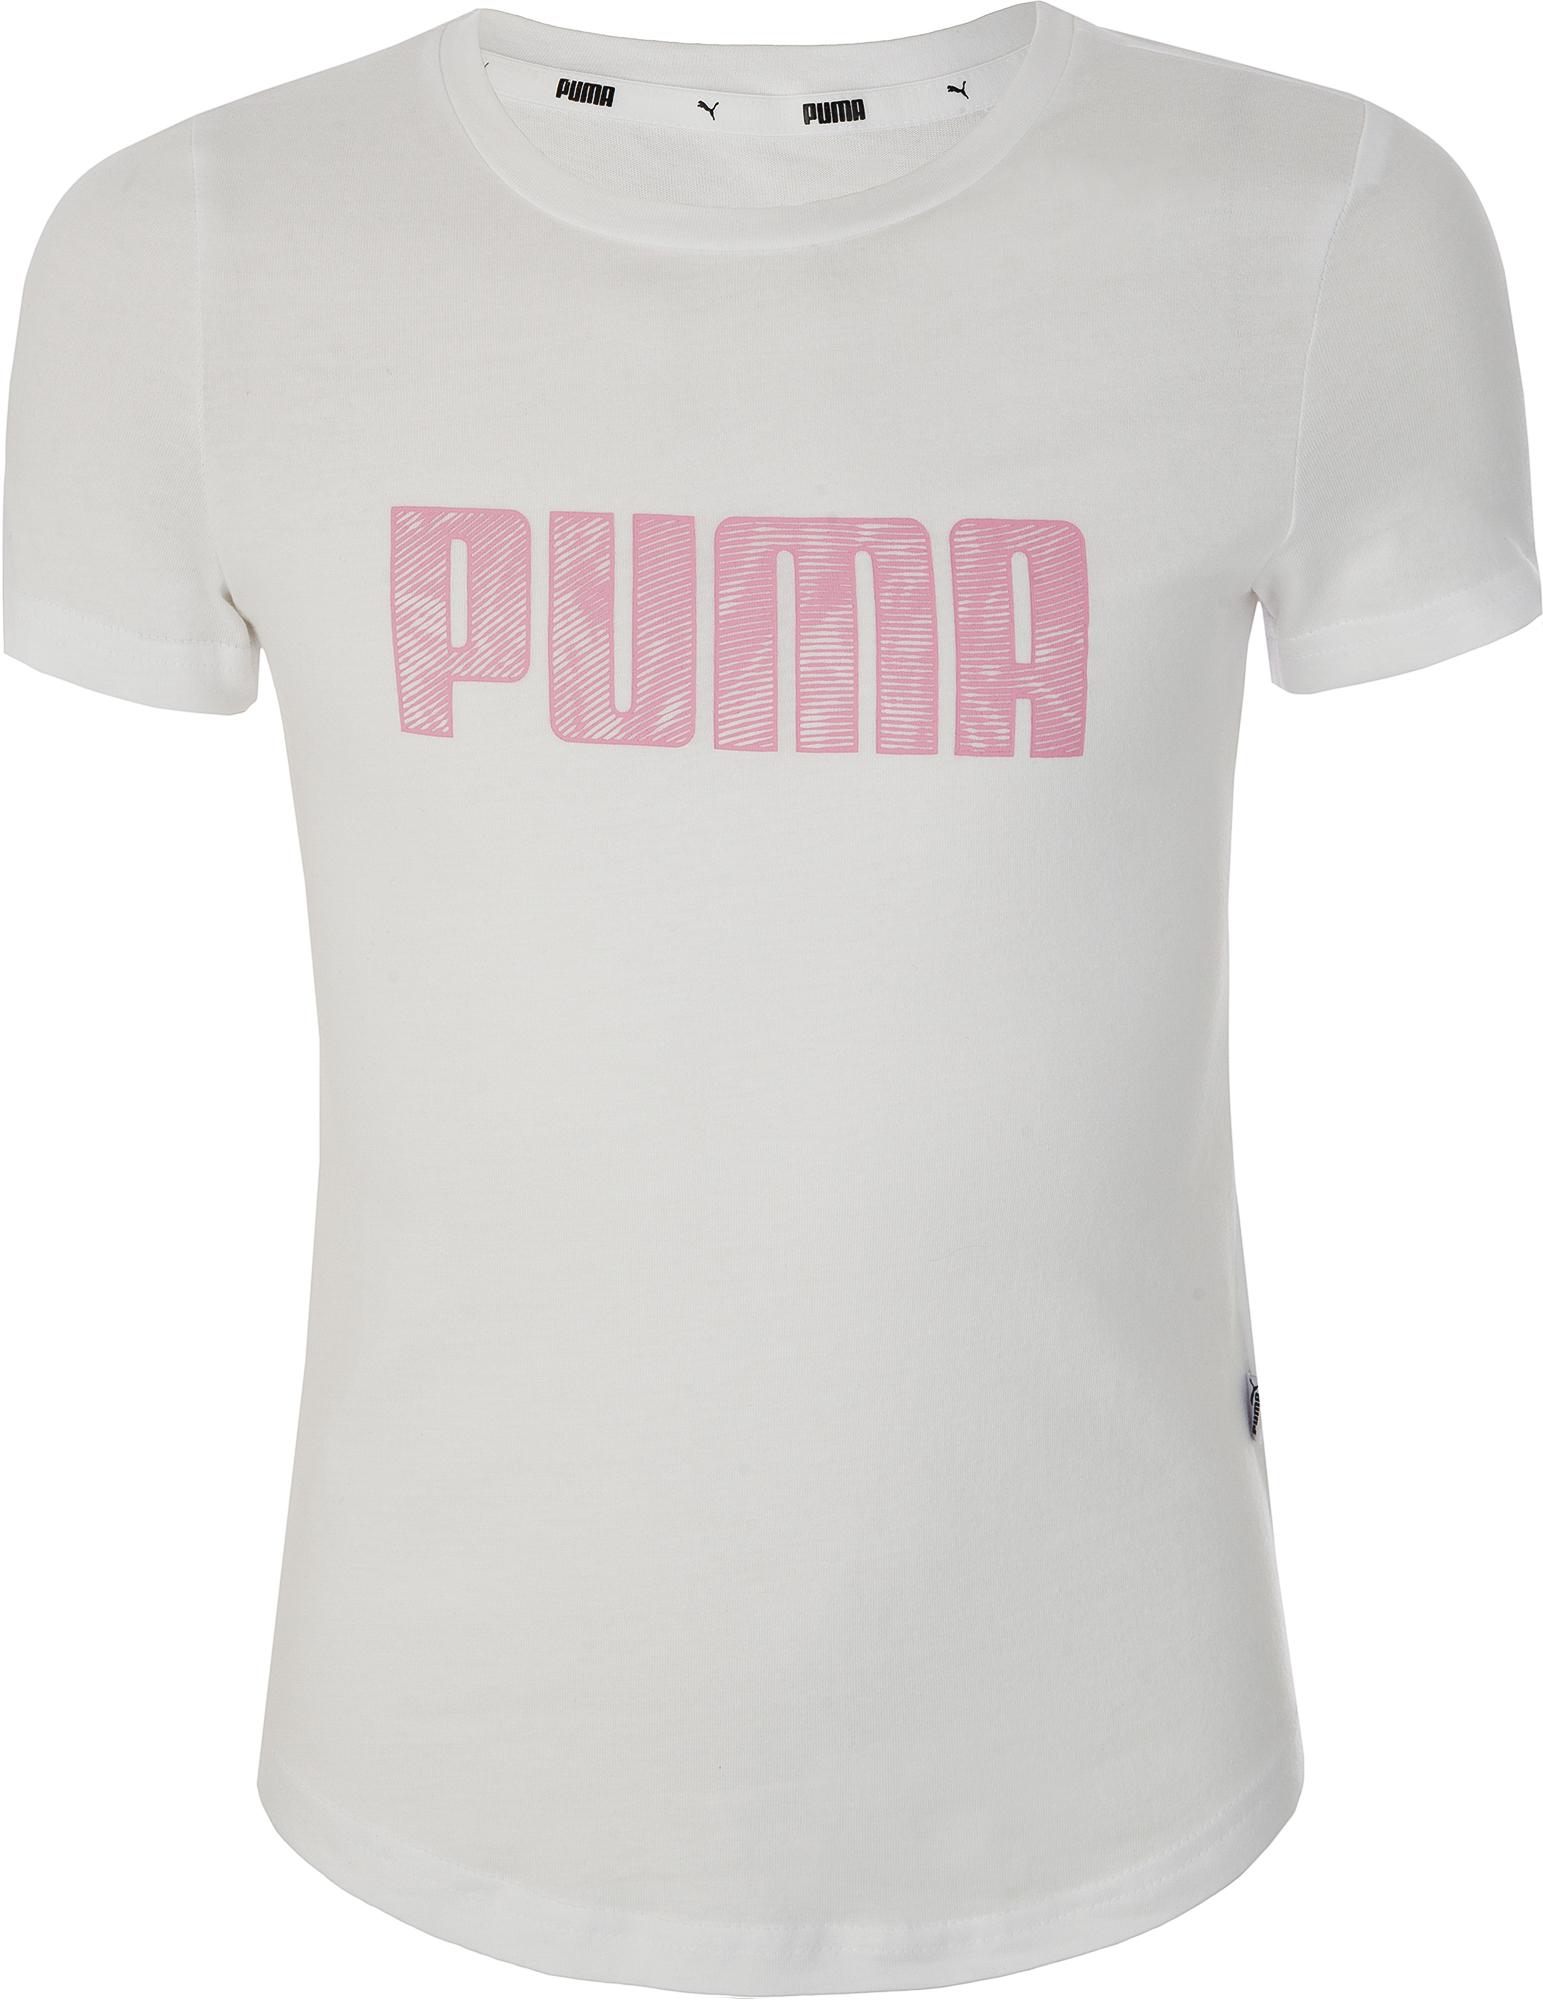 Puma Футболка для девочек Puma KA Tee, размер 164